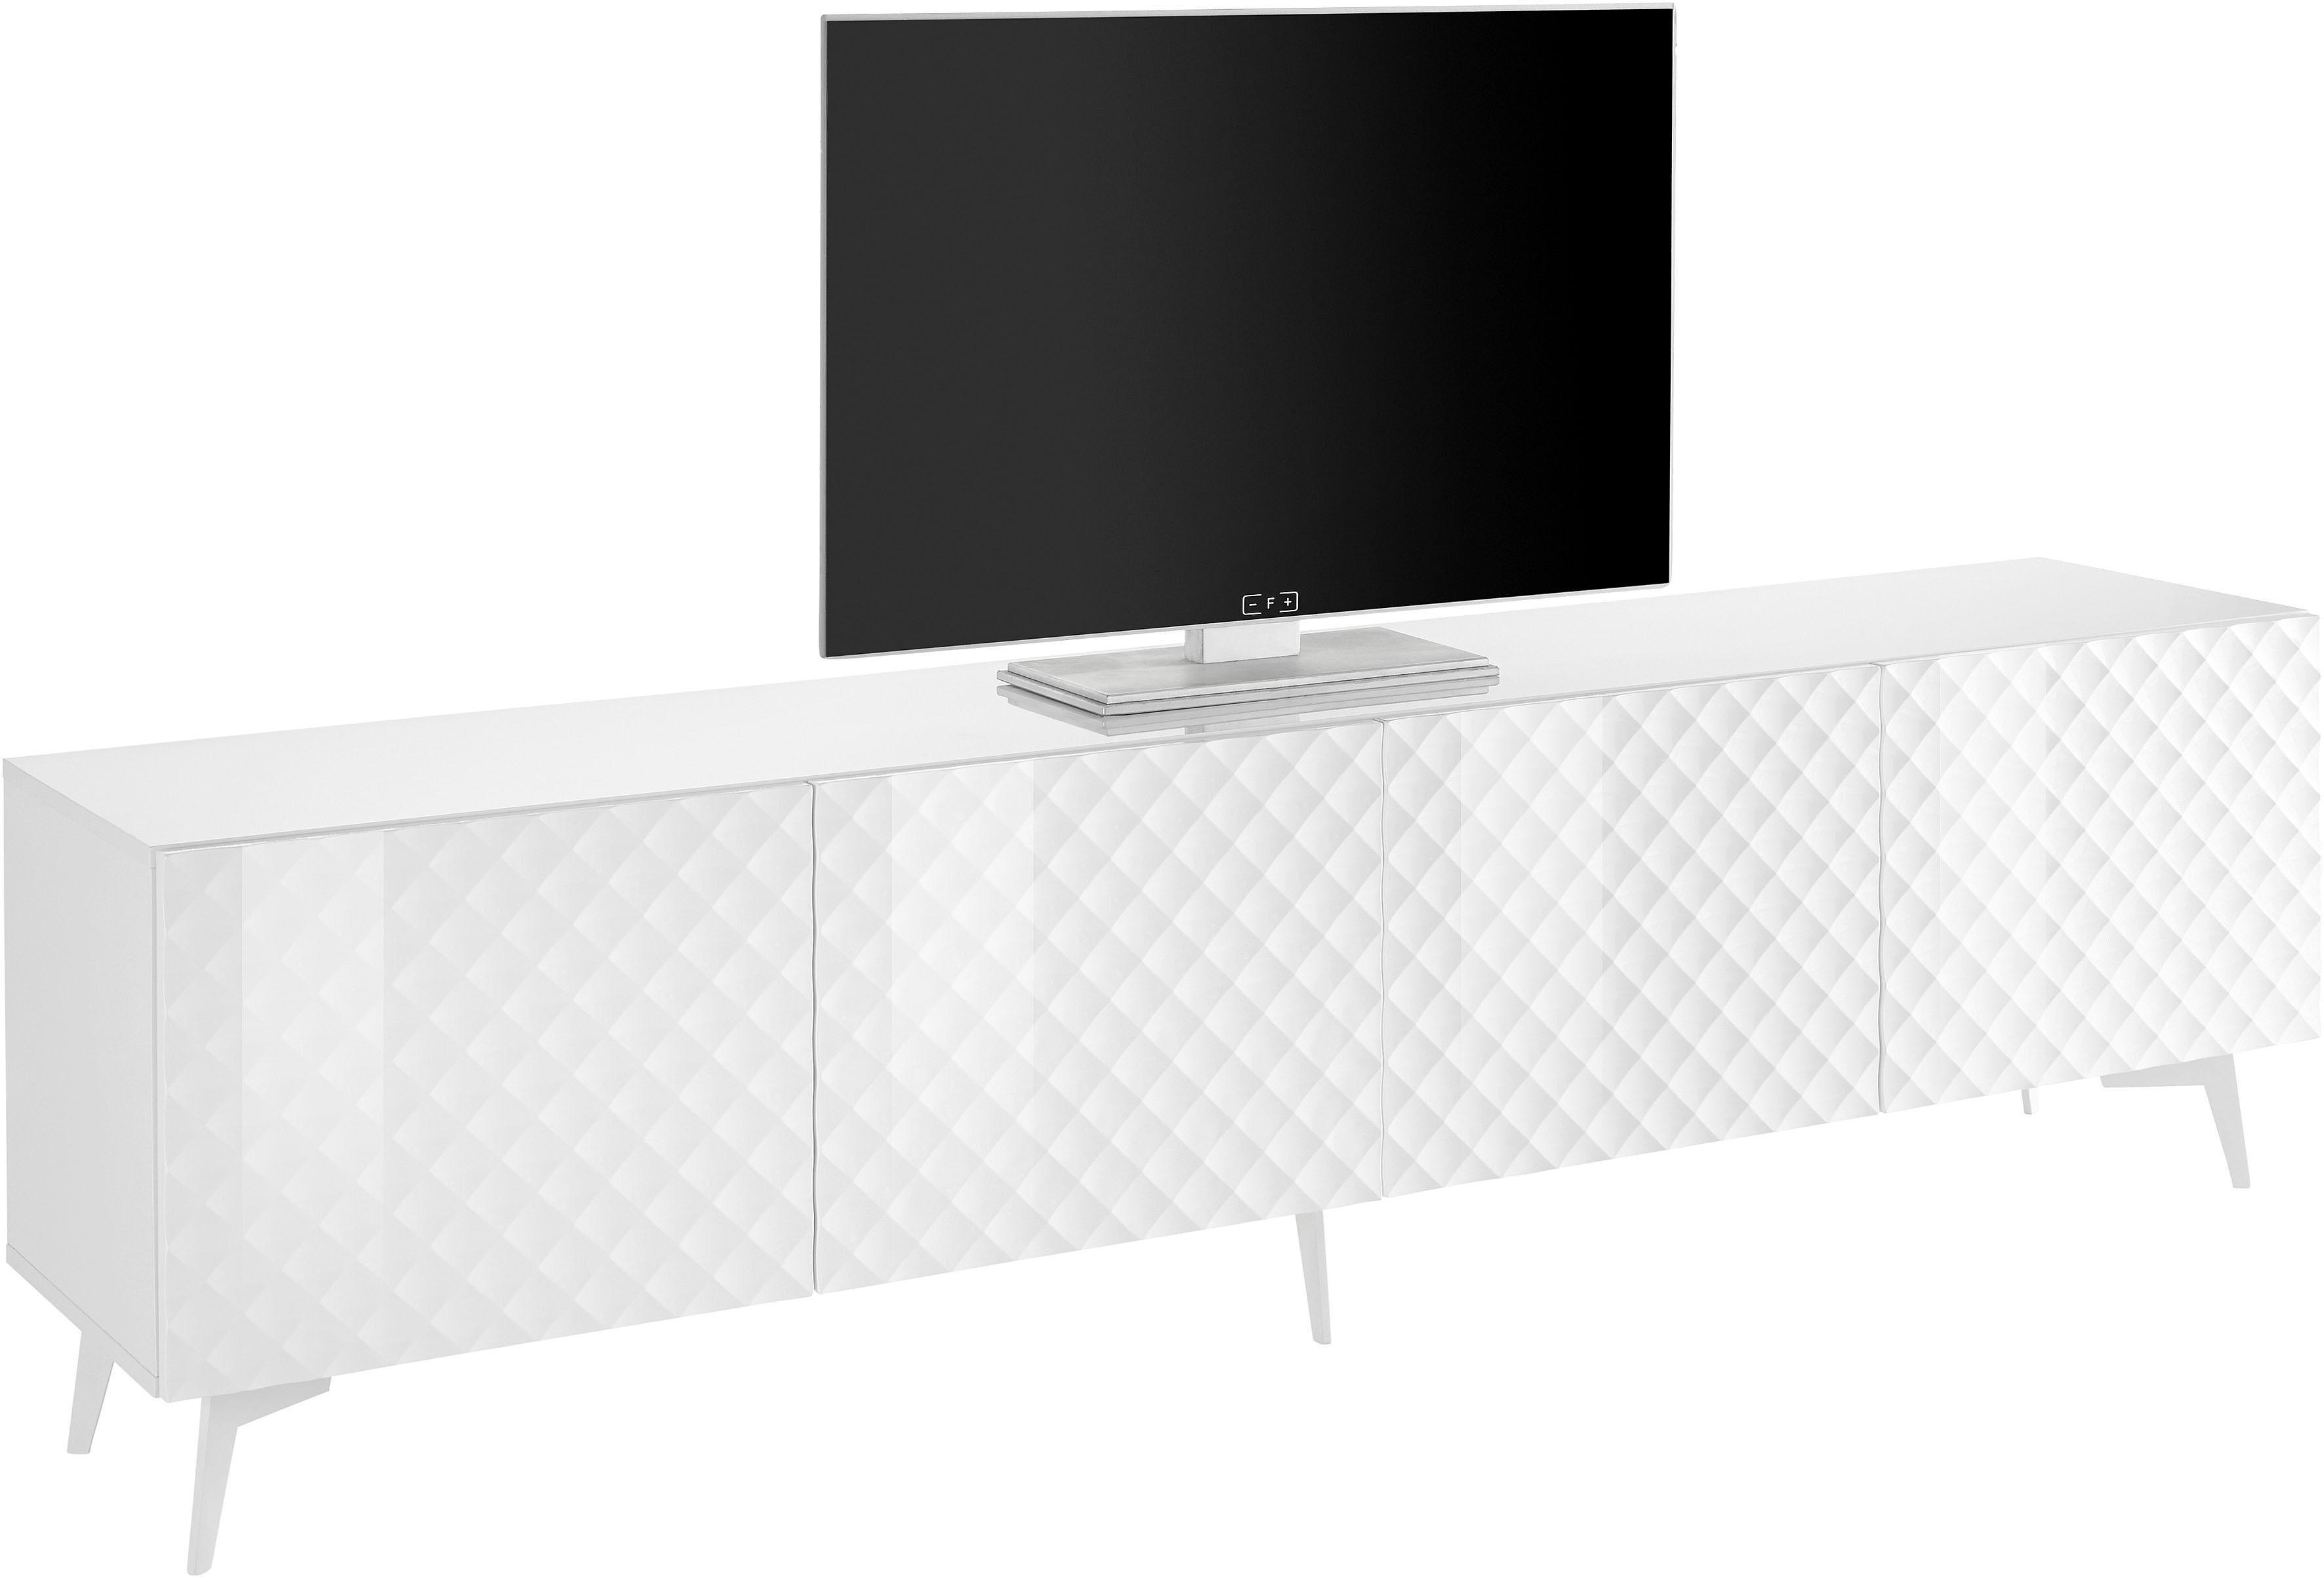 Lowboard design möbel  Bruno-Banani Lowboards online kaufen | Möbel-Suchmaschine ...